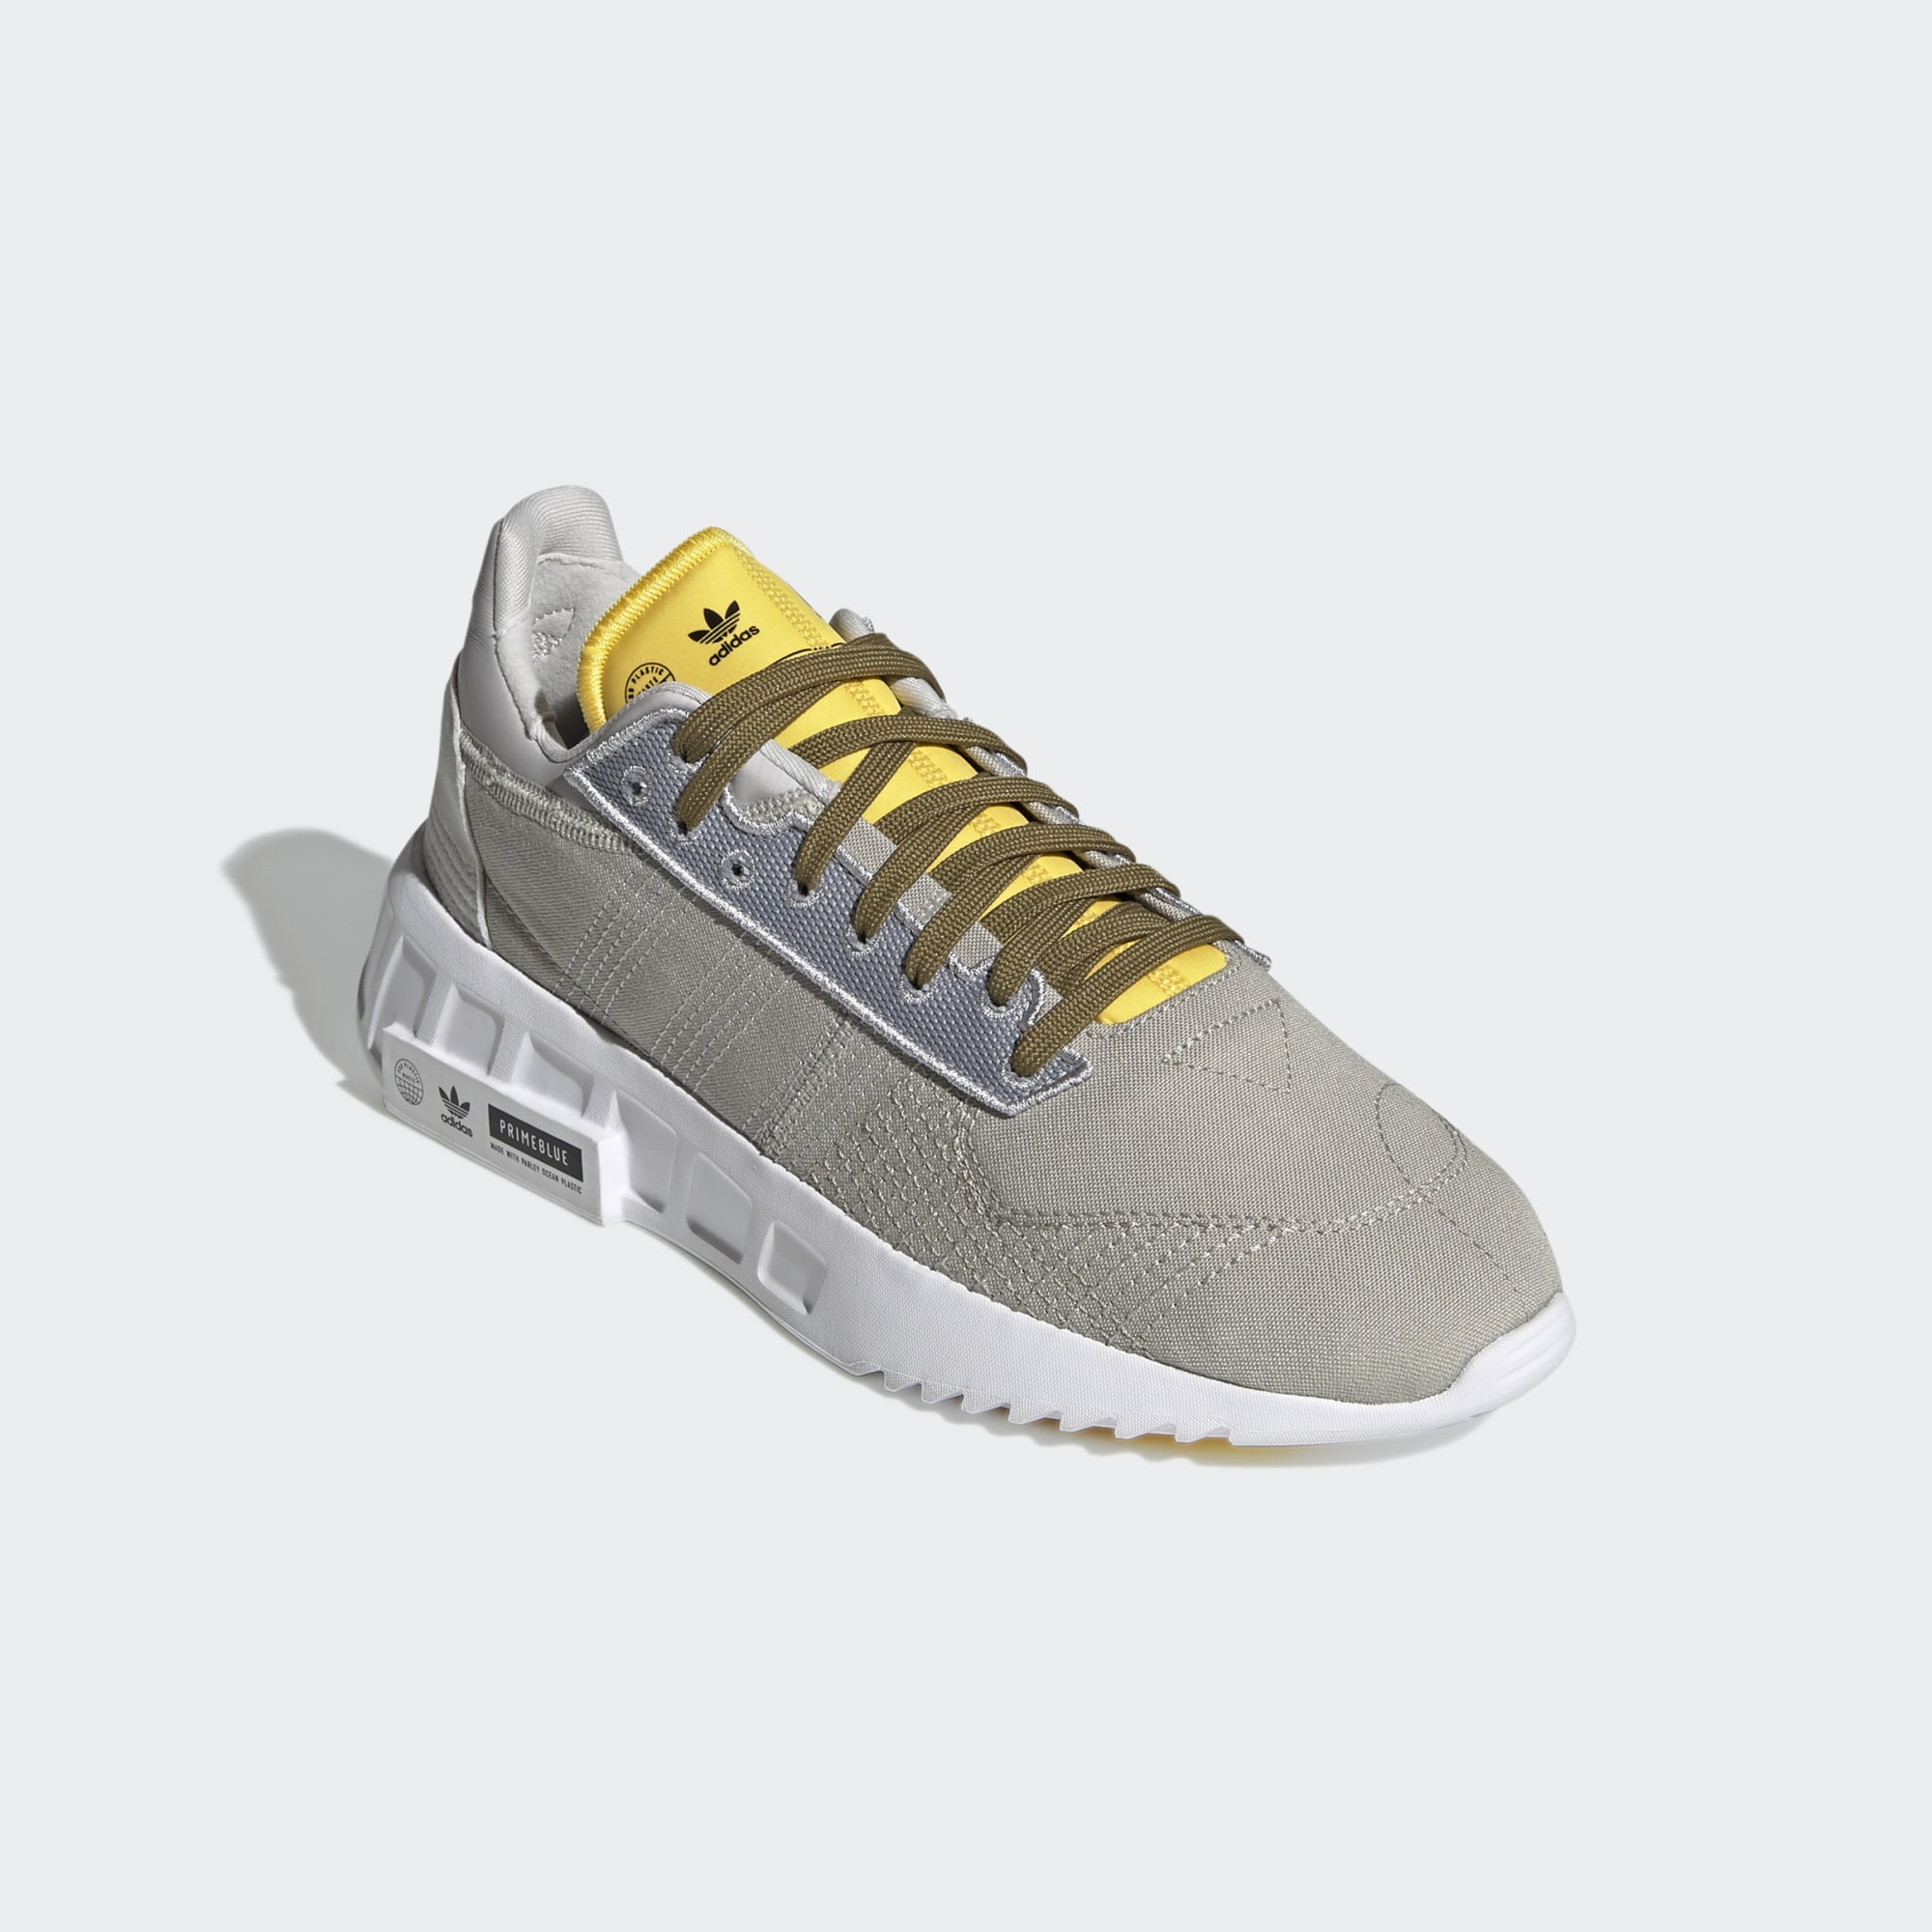 Geodiver_Primeblue_Shoes_Beige_G55758_04_standard.jpg